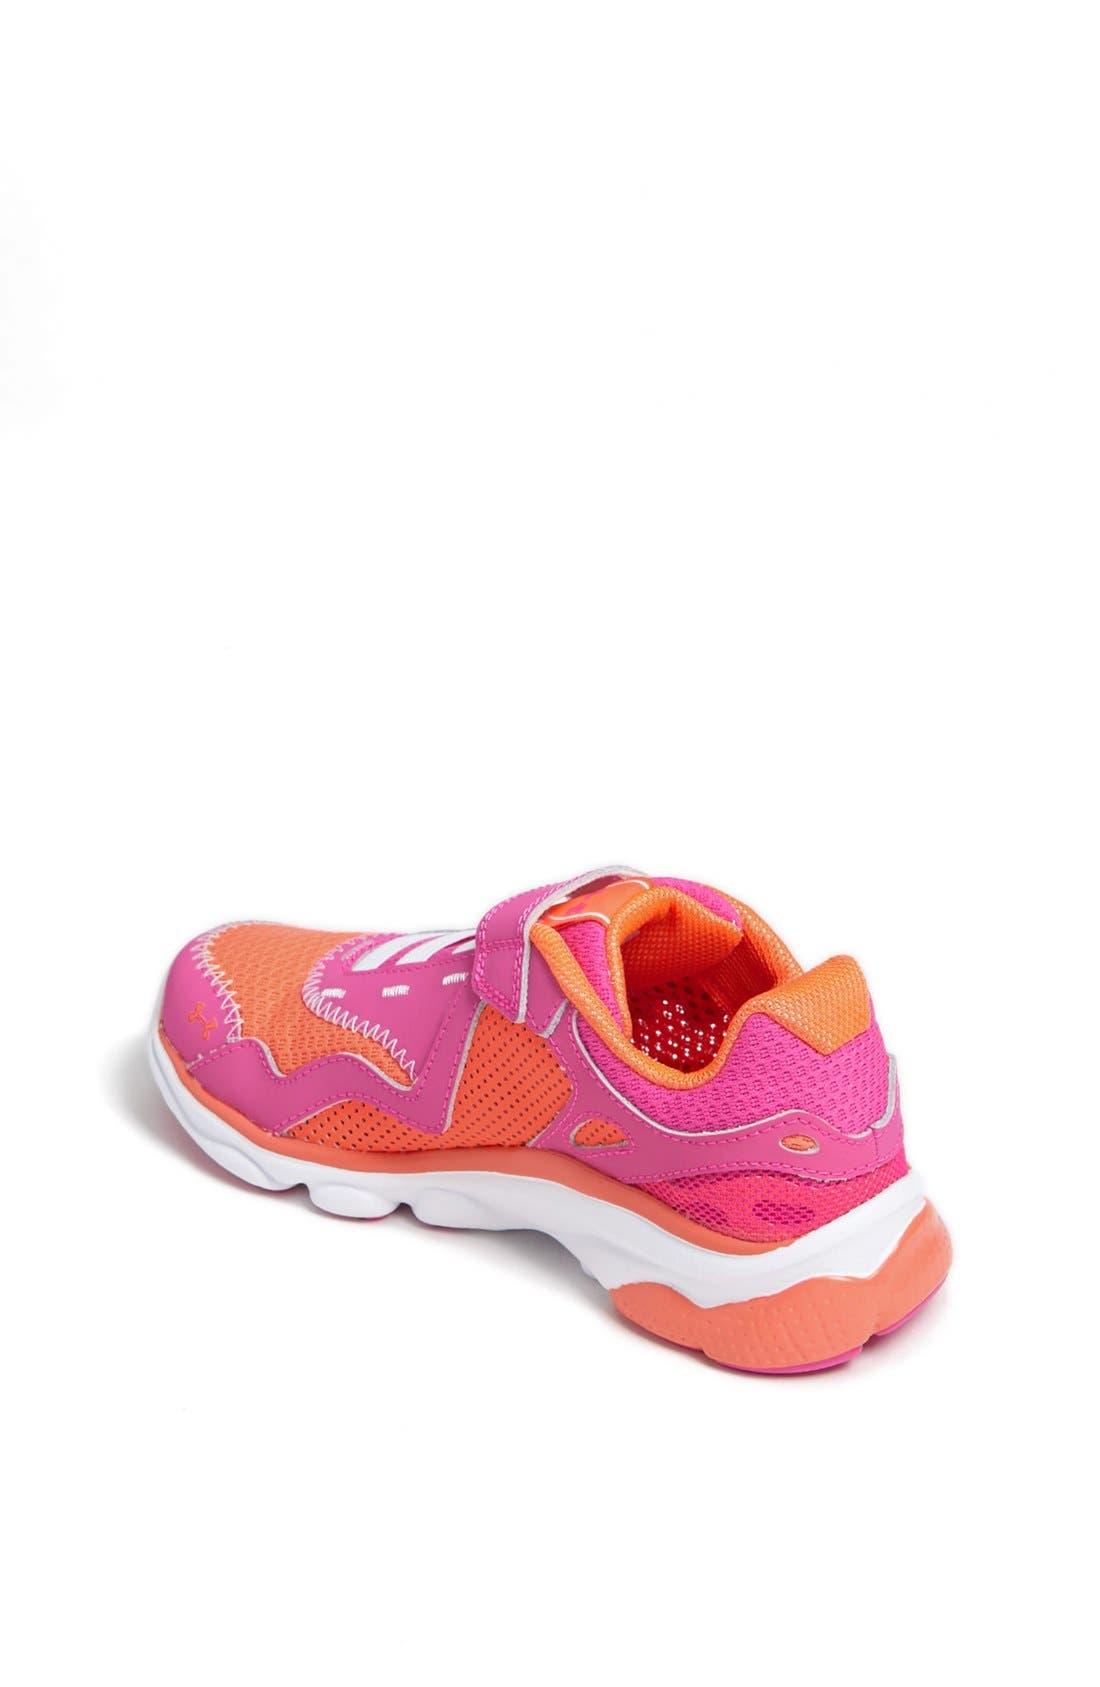 Alternate Image 2  - Under Armour 'Assert III' Athletic Shoe (Baby, Walker, Toddler & Little Kid)